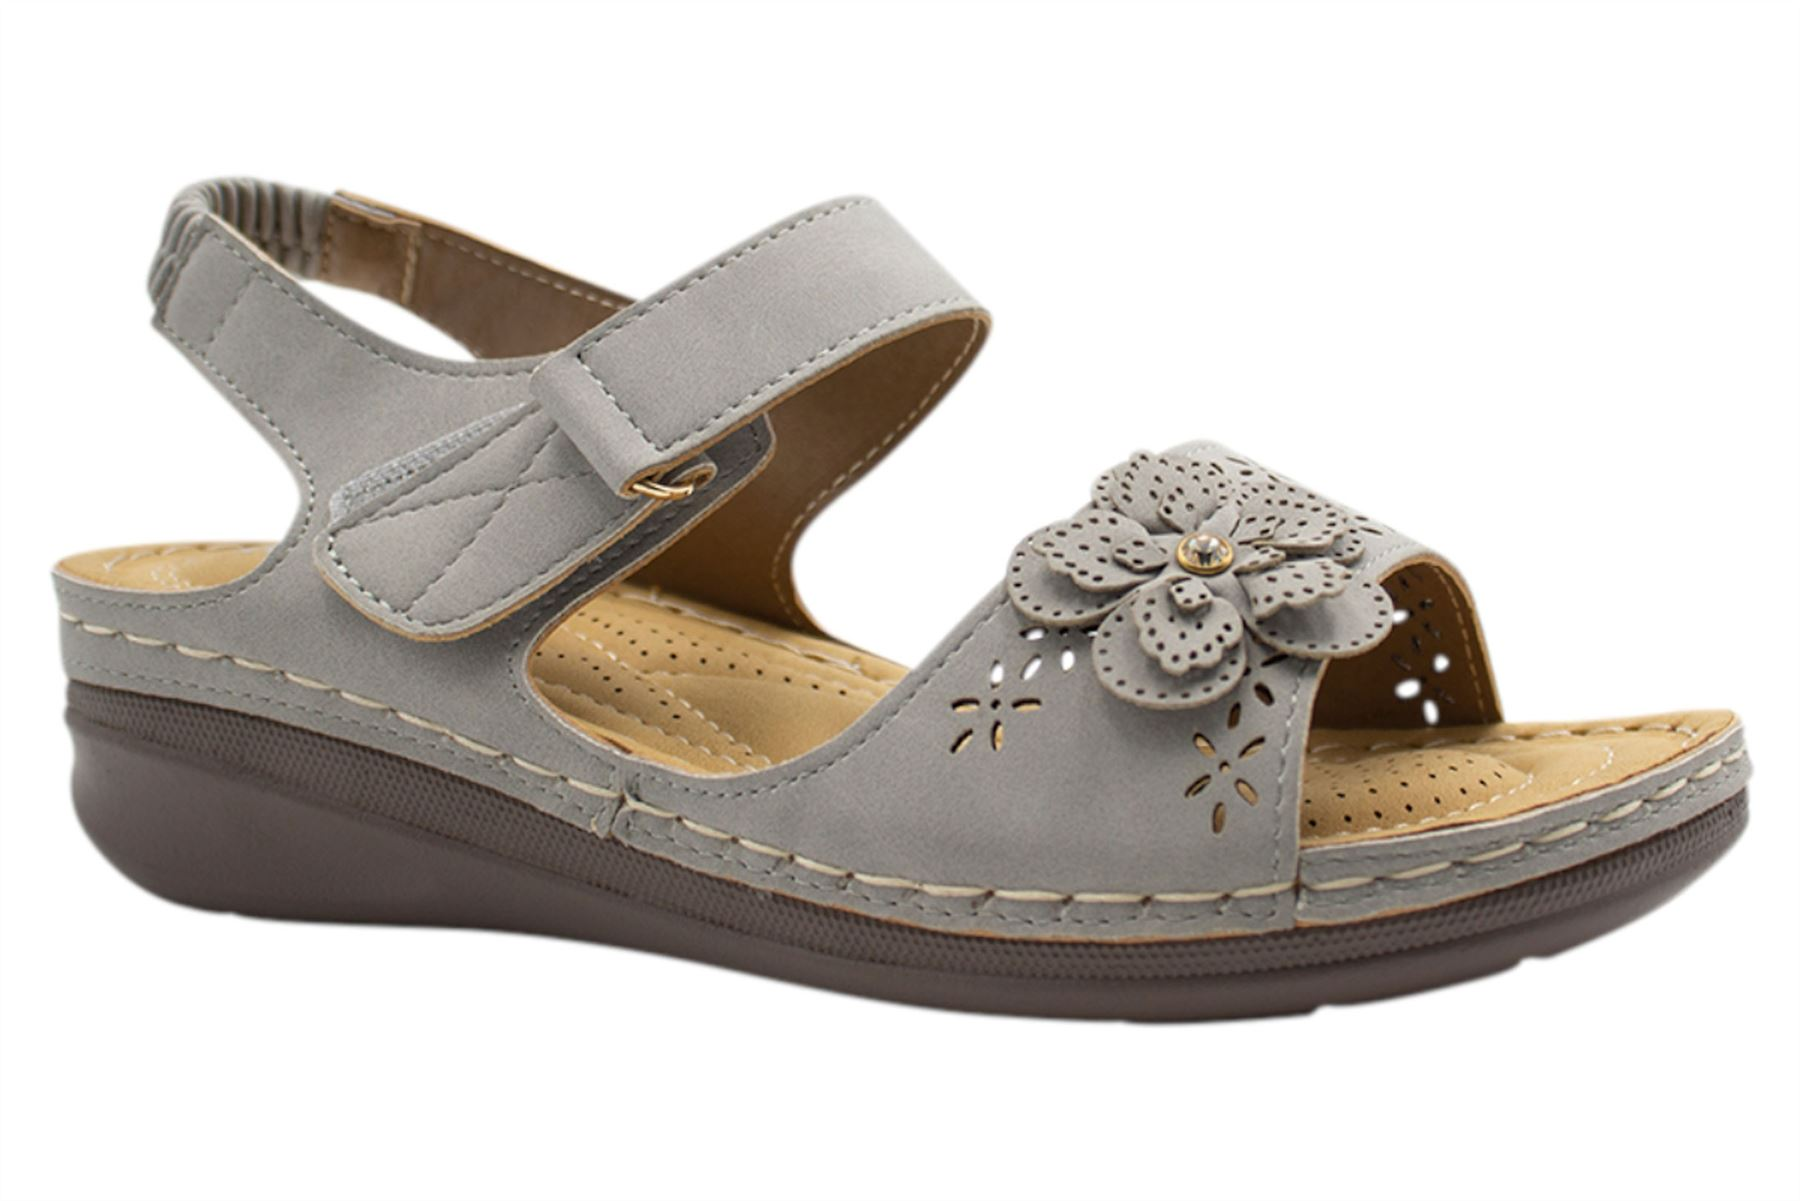 Ladies-Sandals-Womens-Mid-Heel-Comfort-Summer-Beach-Casual-Wear miniatura 27